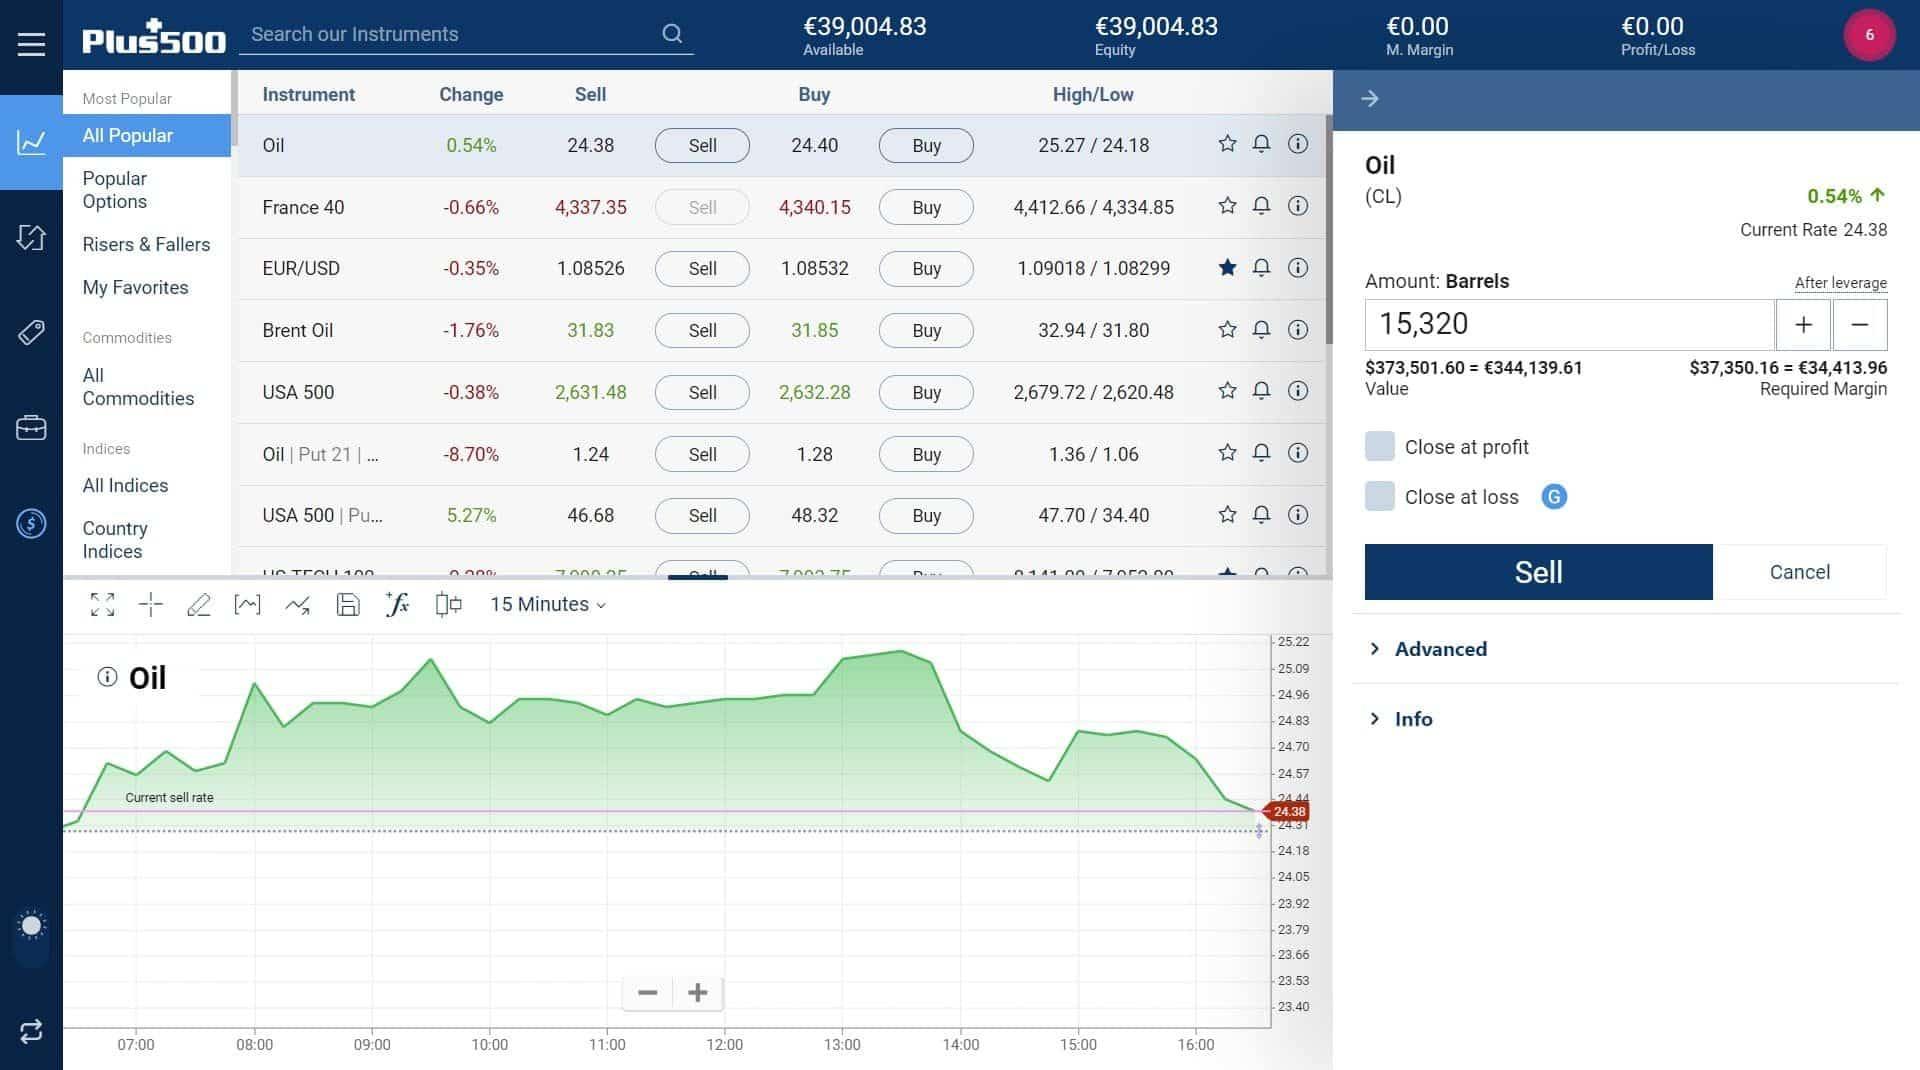 Crude oil trading on Plus500's platform